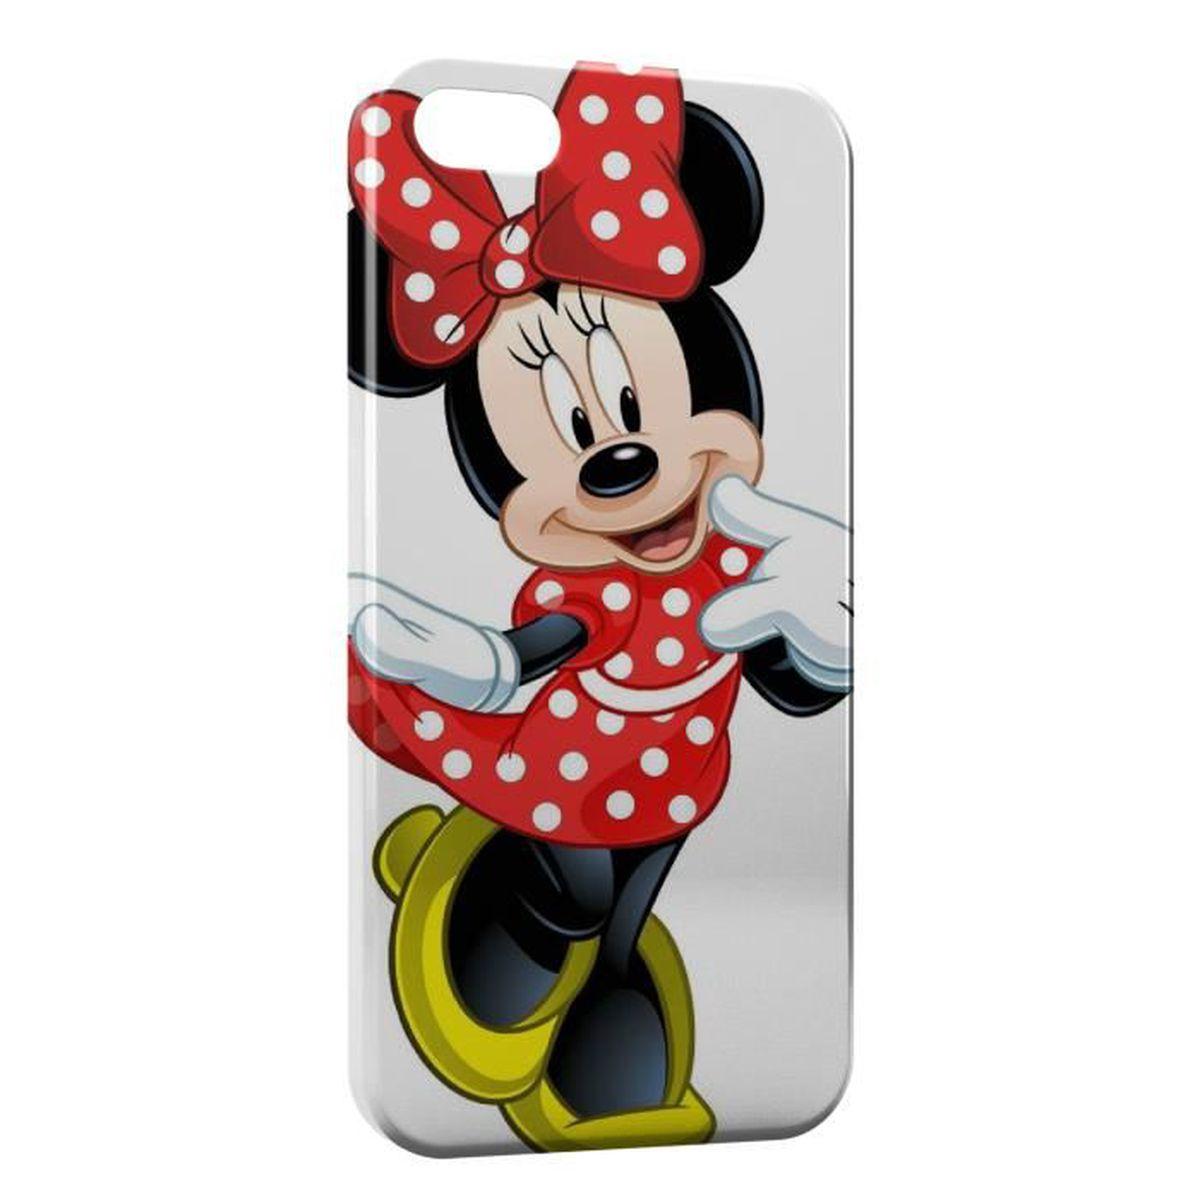 coque iphone 5 5s minnie mickey 4